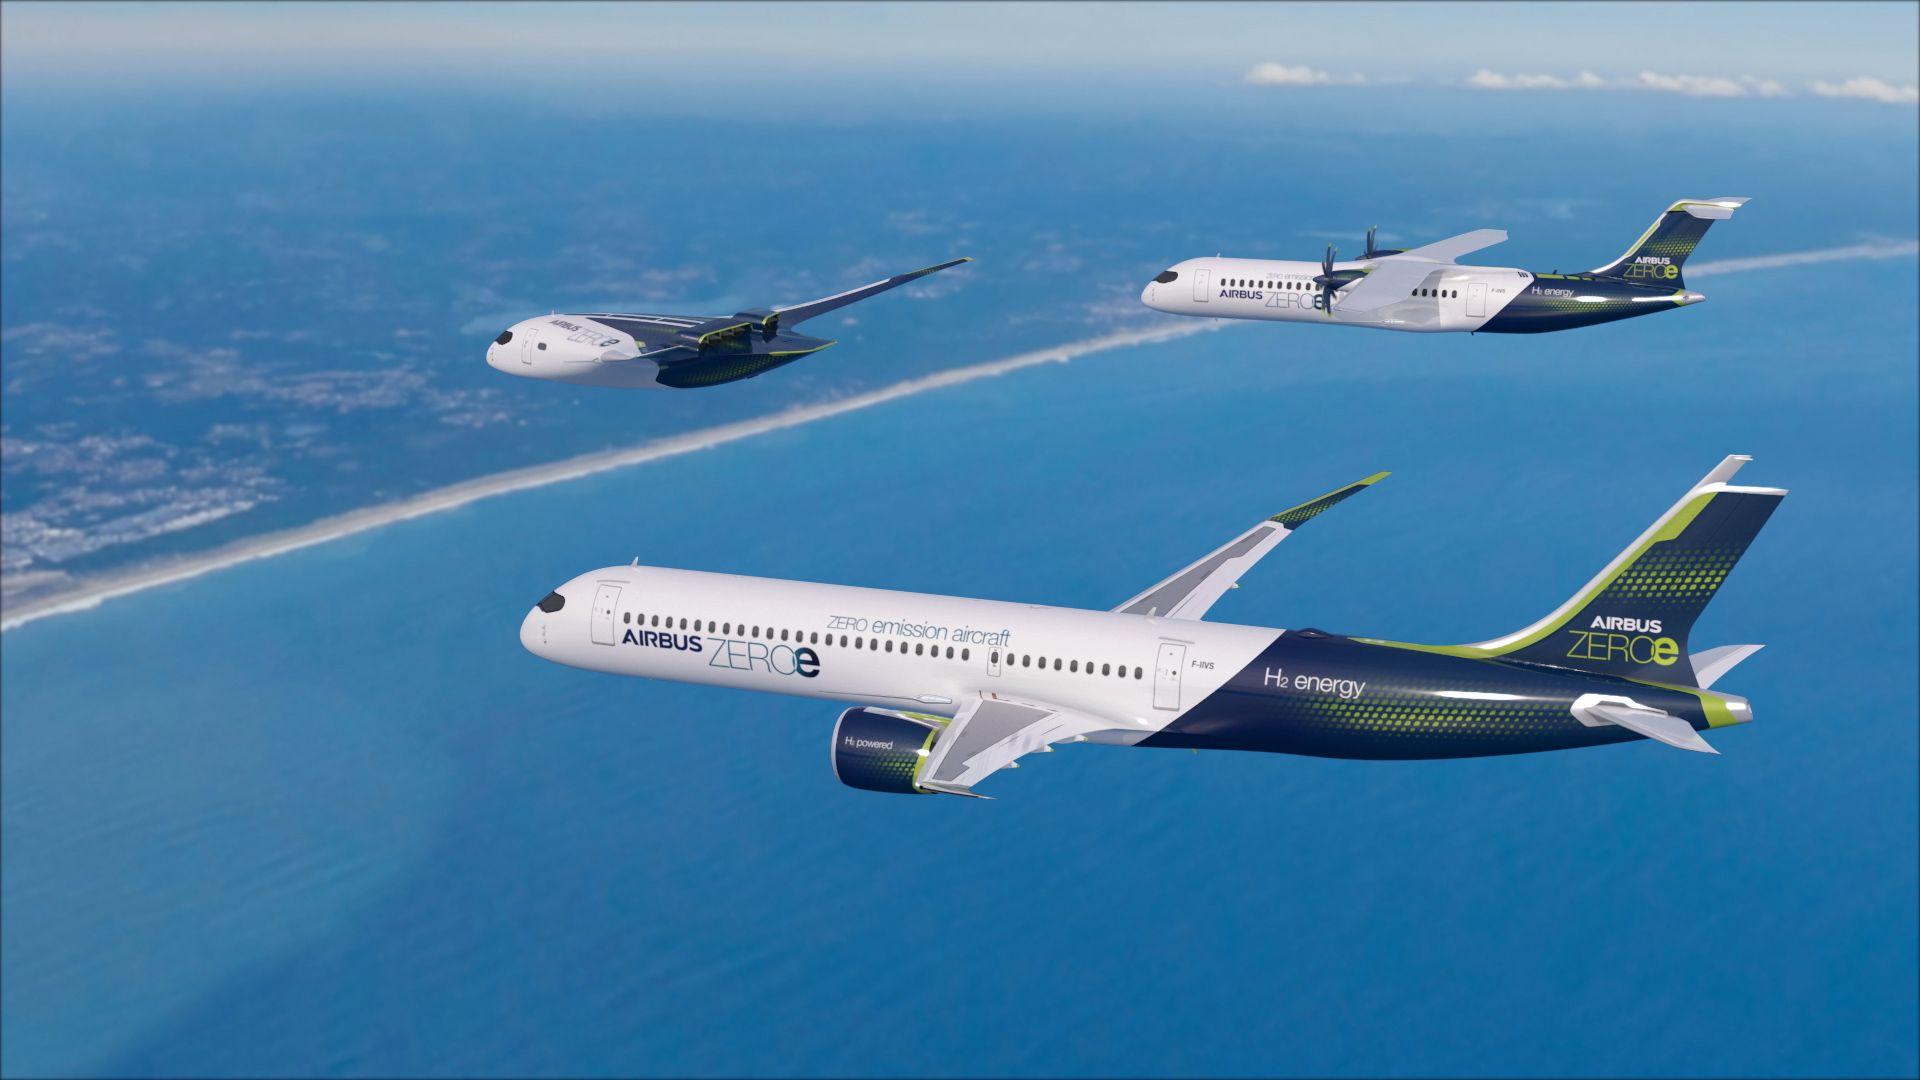 Airbus Zeroe Concepts Air